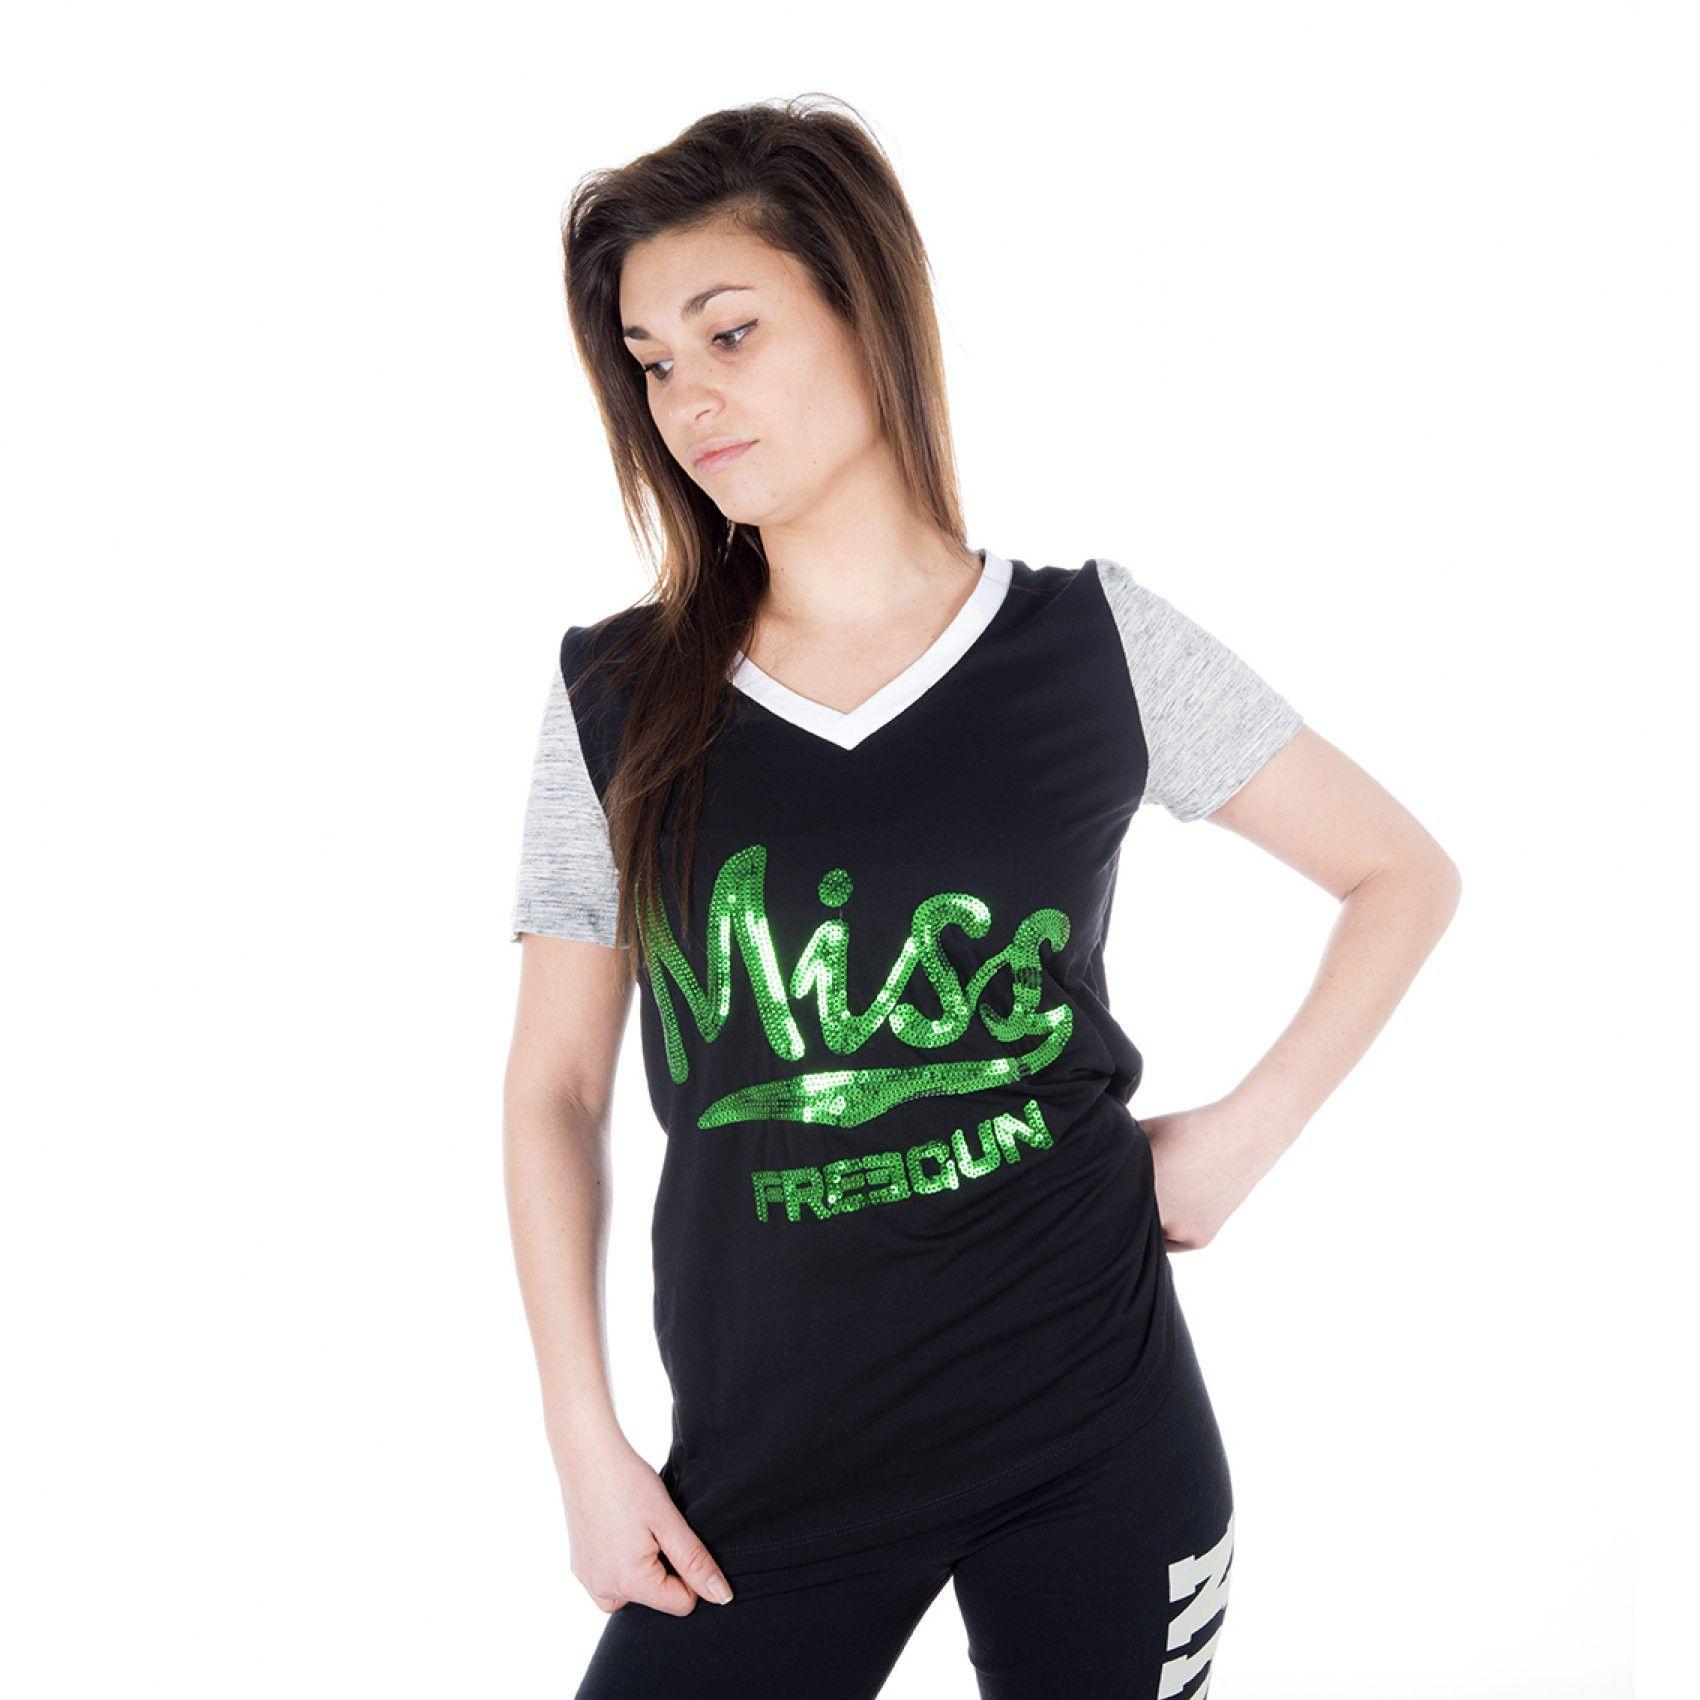 T-shirt freegun femme manches courtes uni